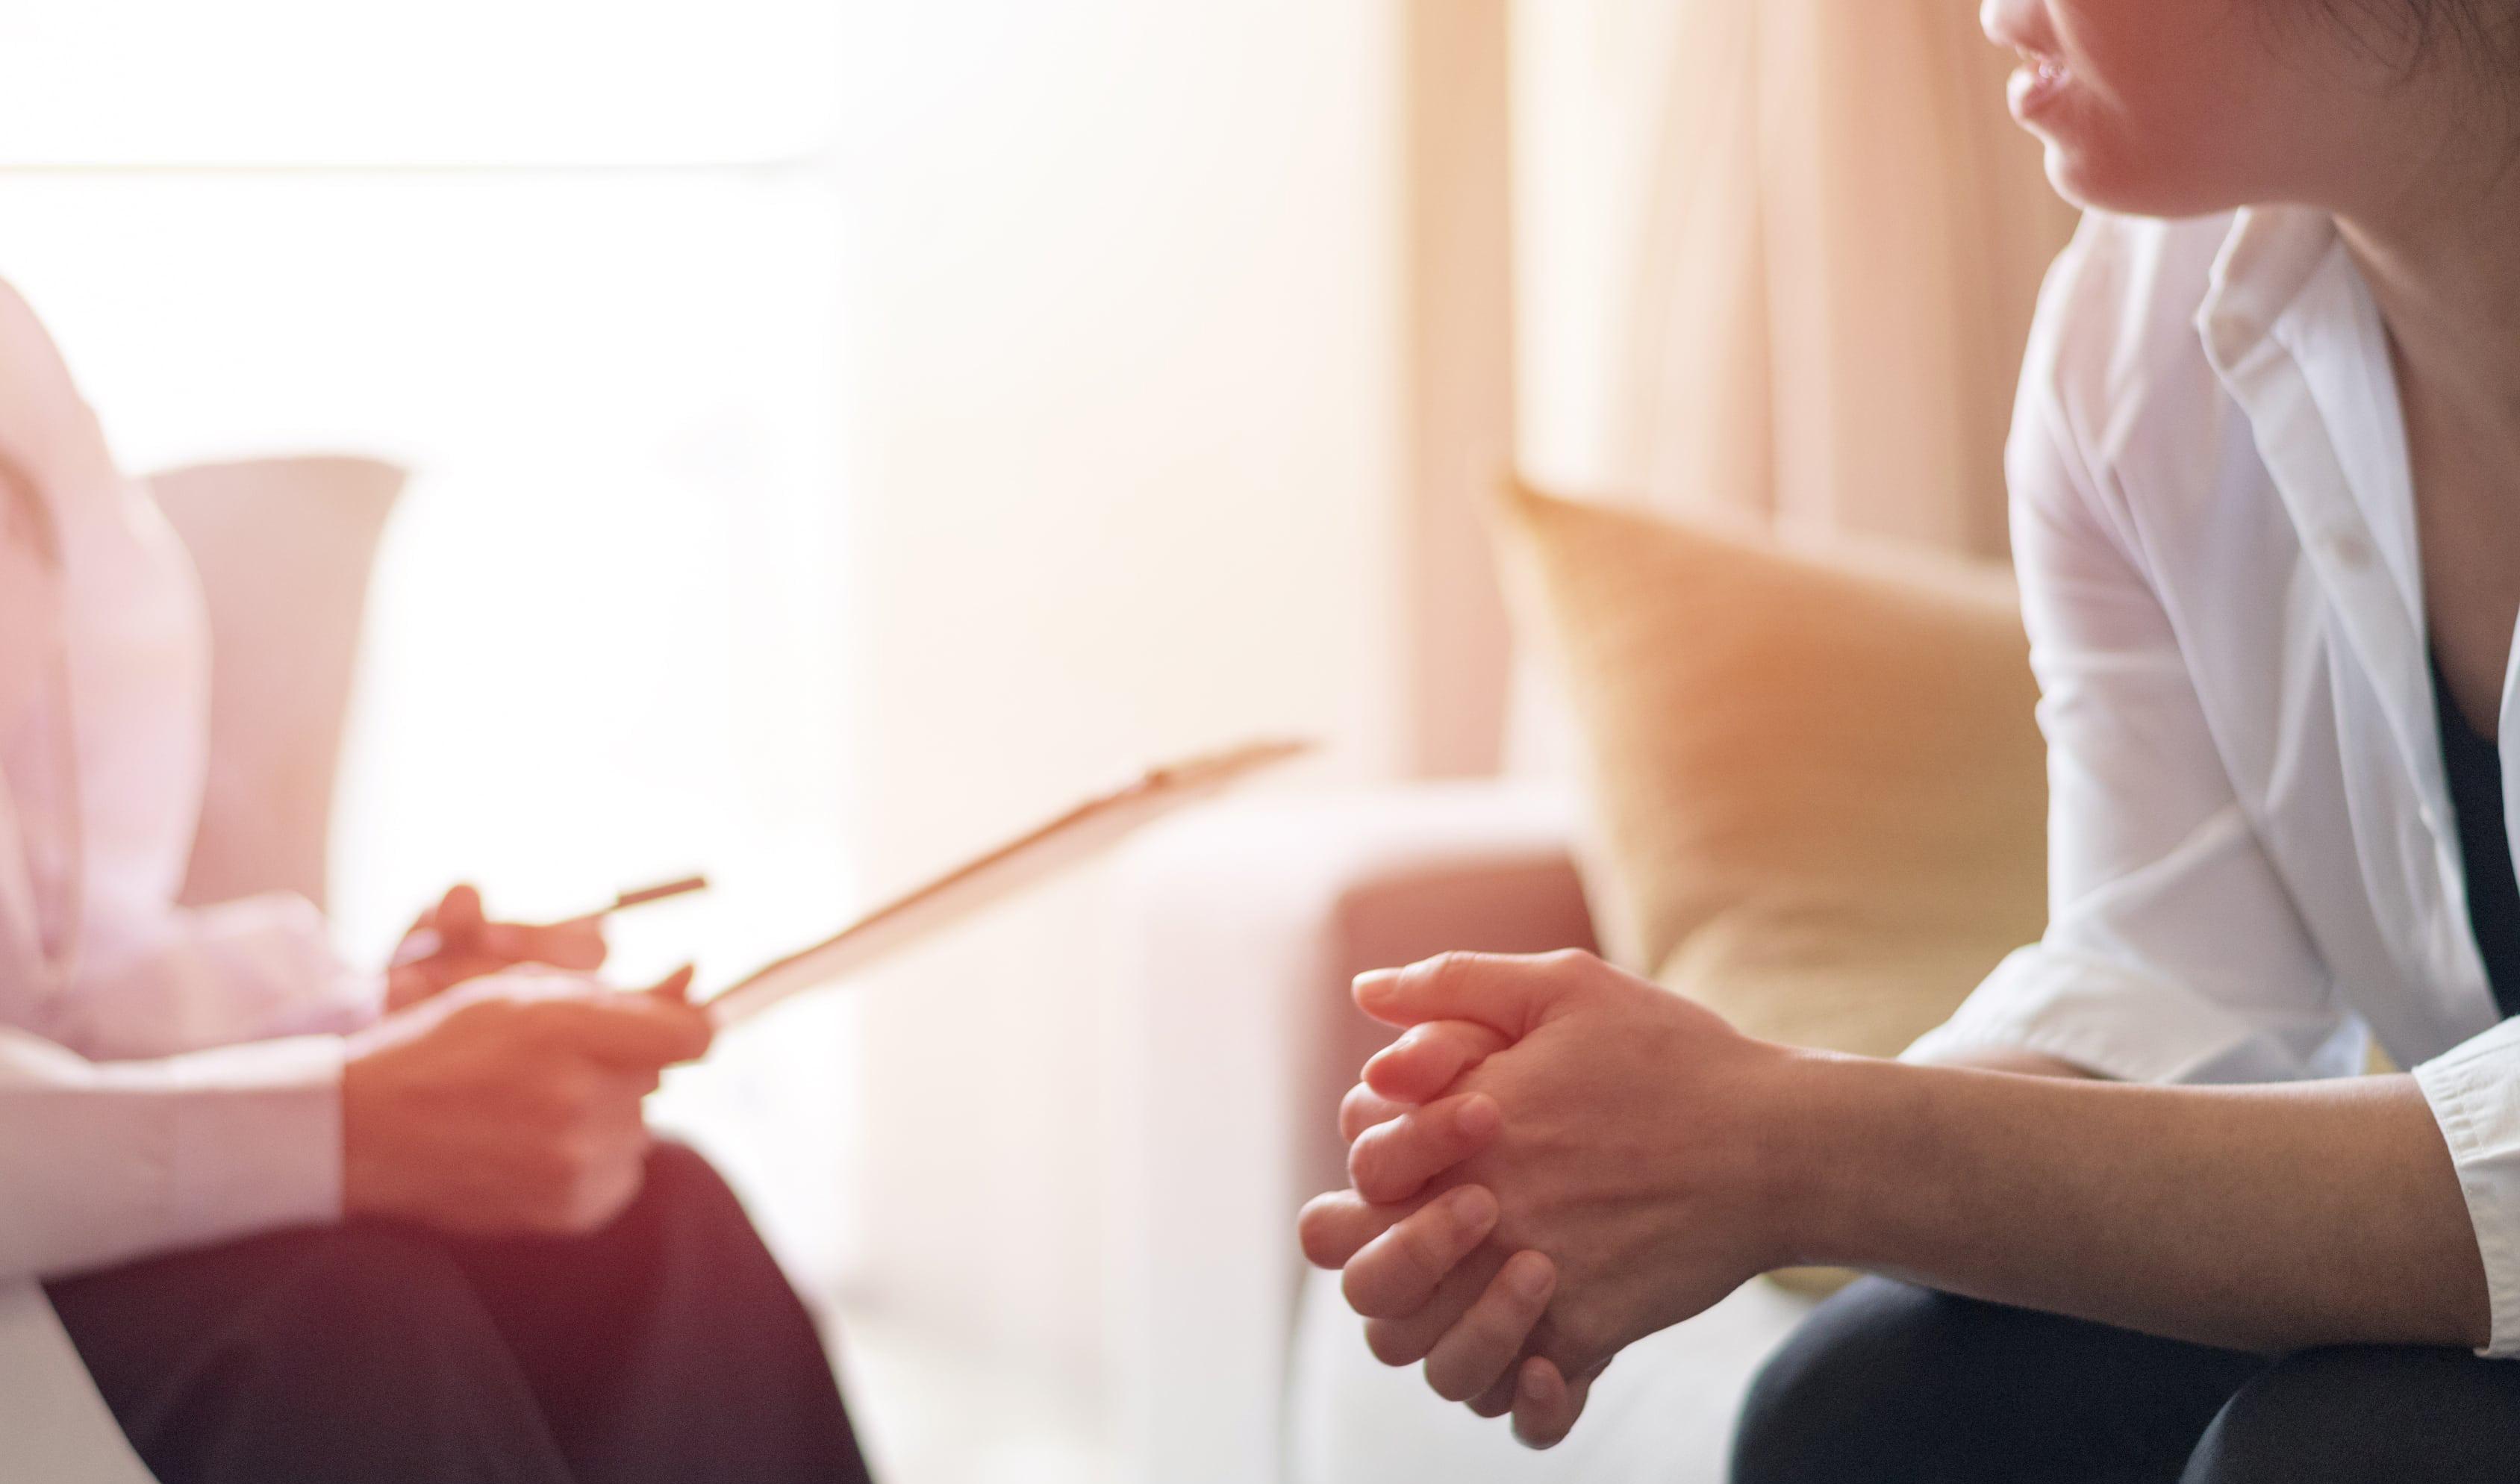 Asistir a psicoterapia